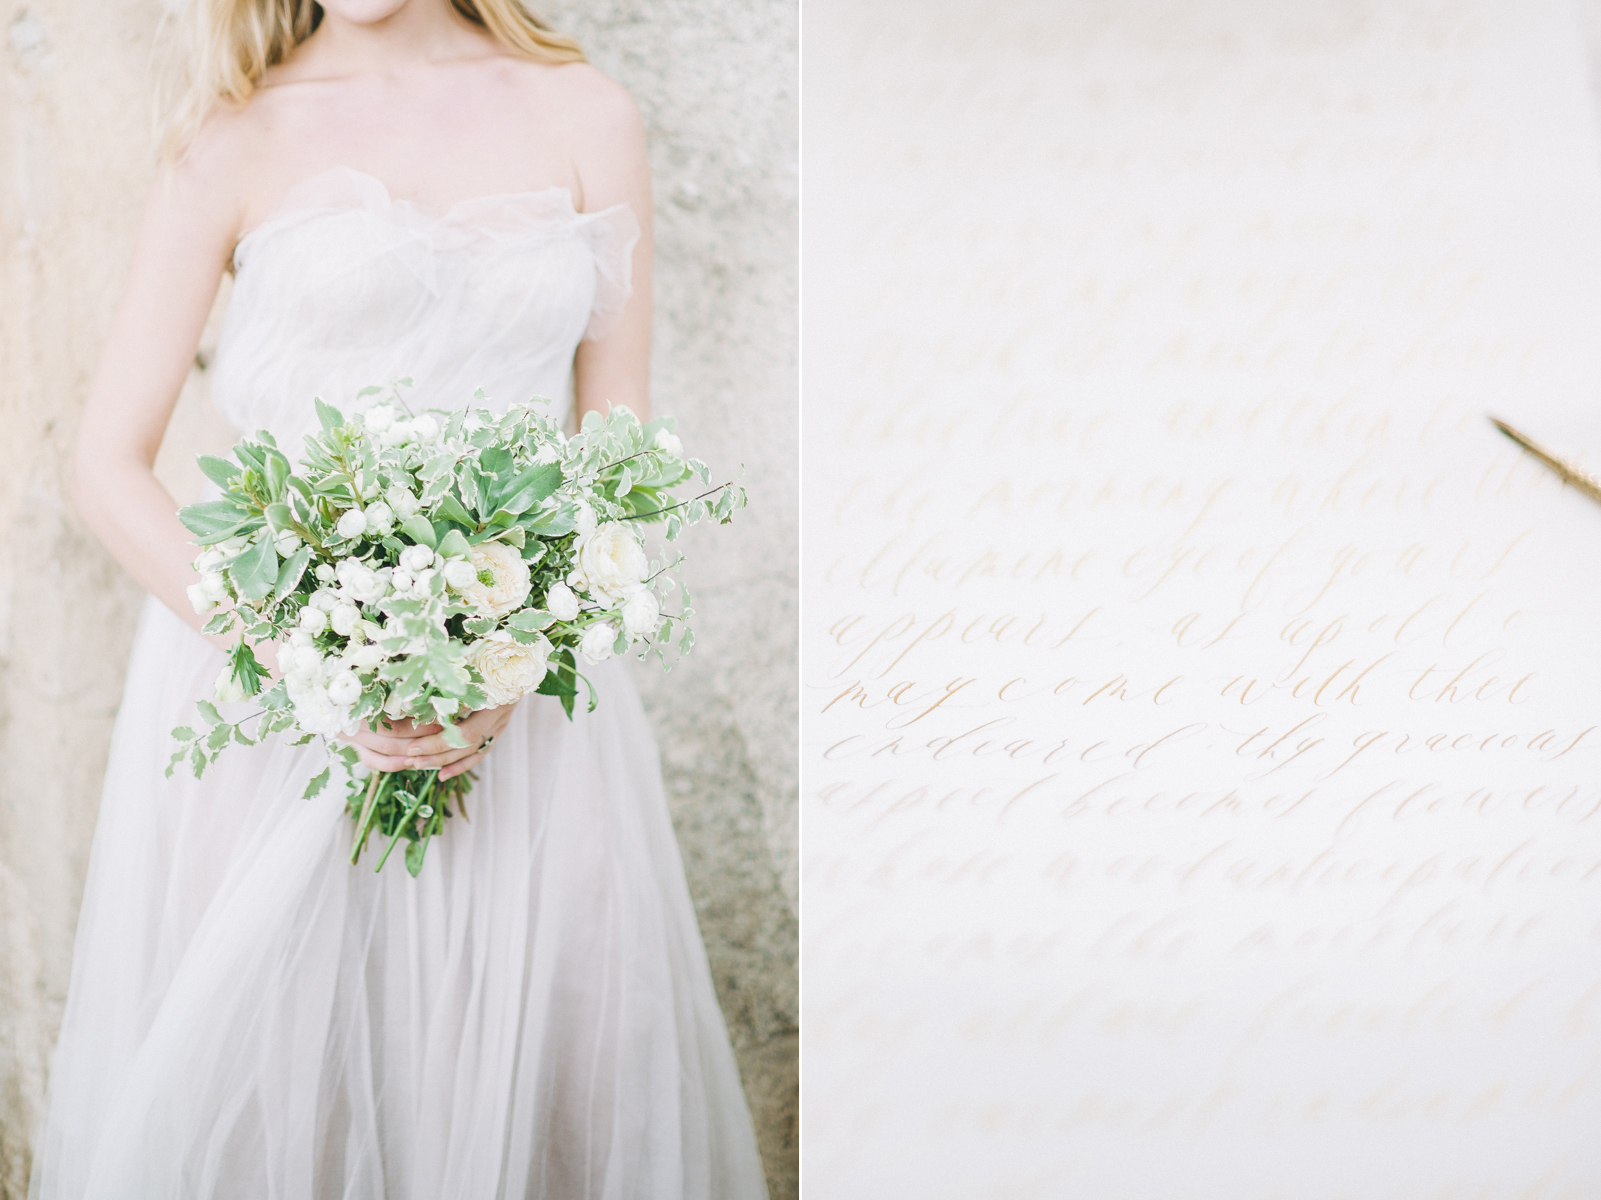 Boheme-Moon-wedding-photography-ravello-italy_12.jpg